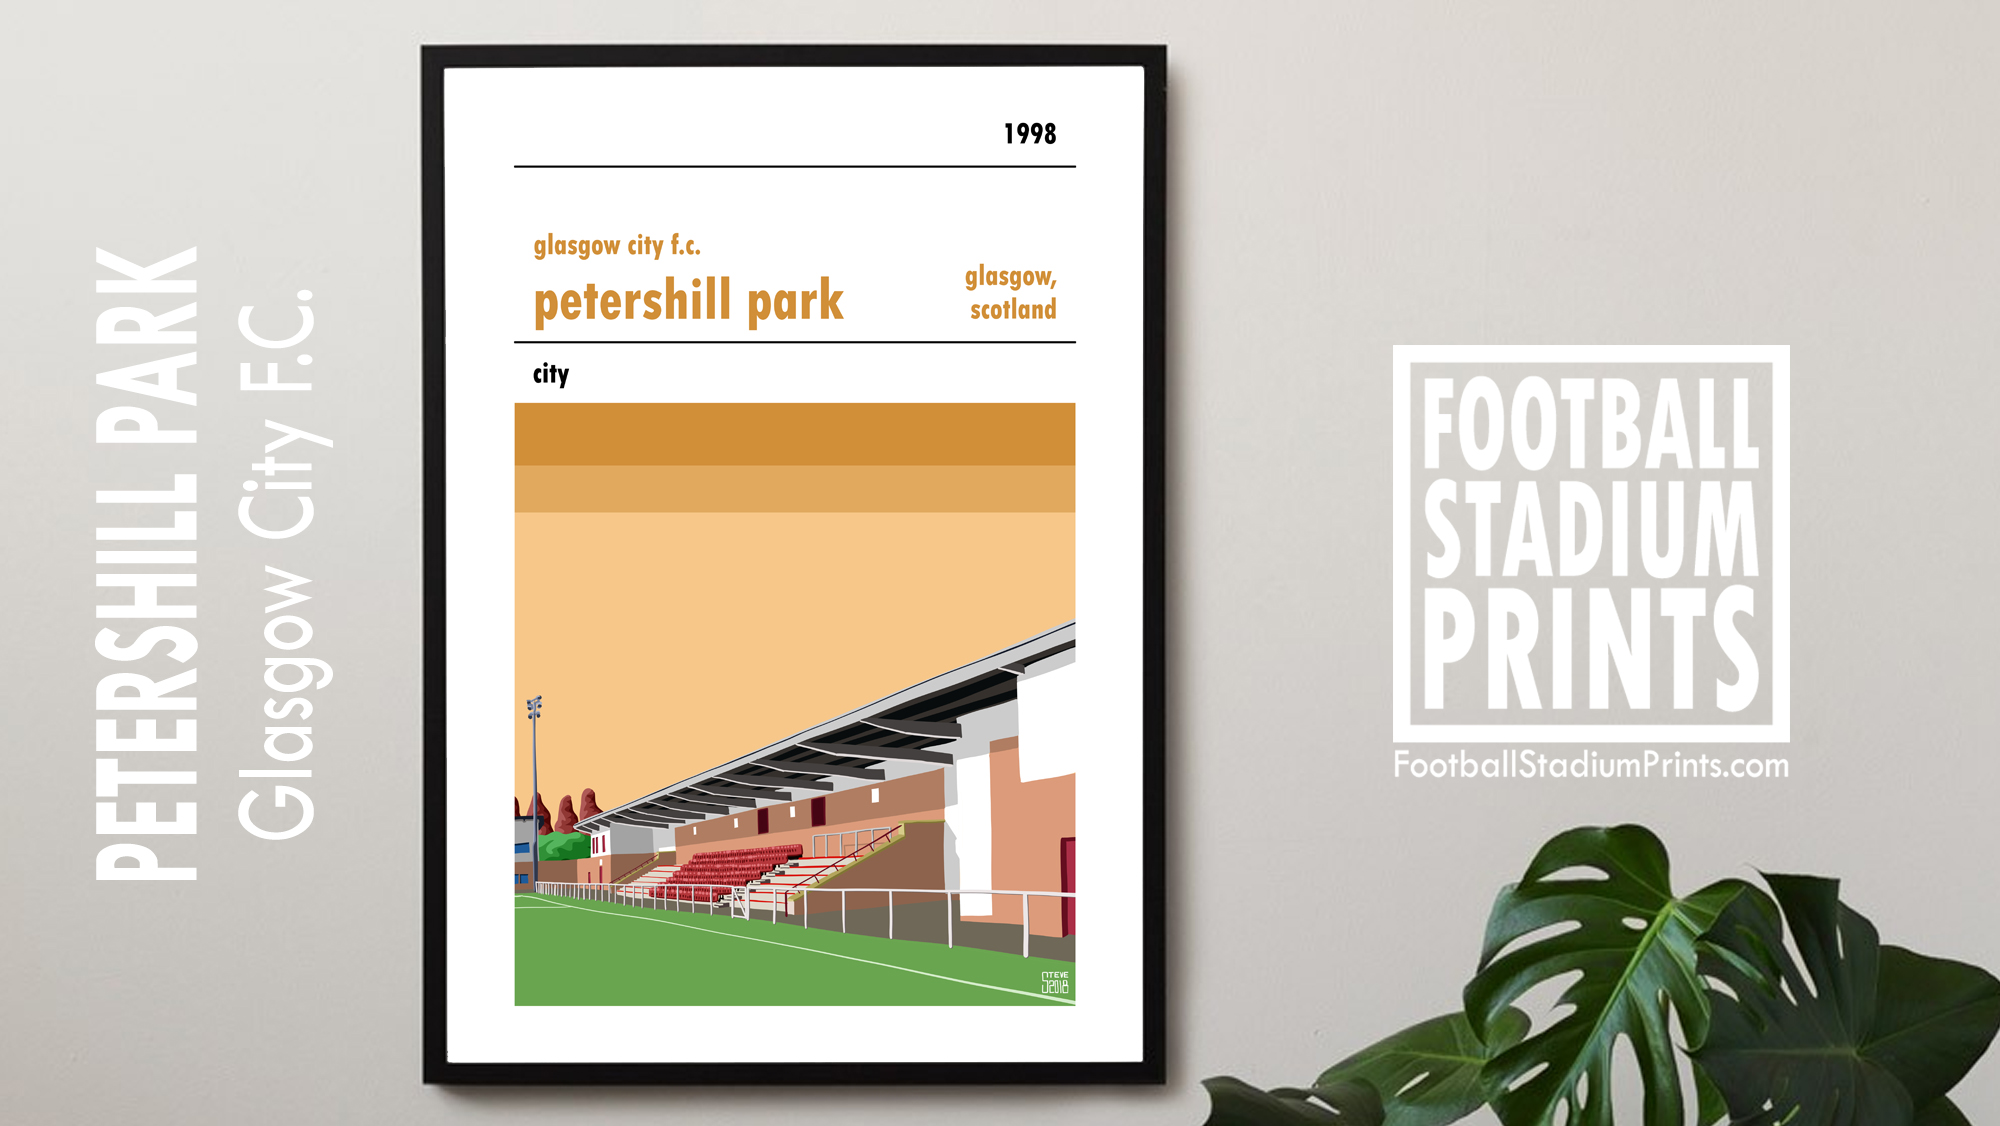 Petershill Park Glasgow City